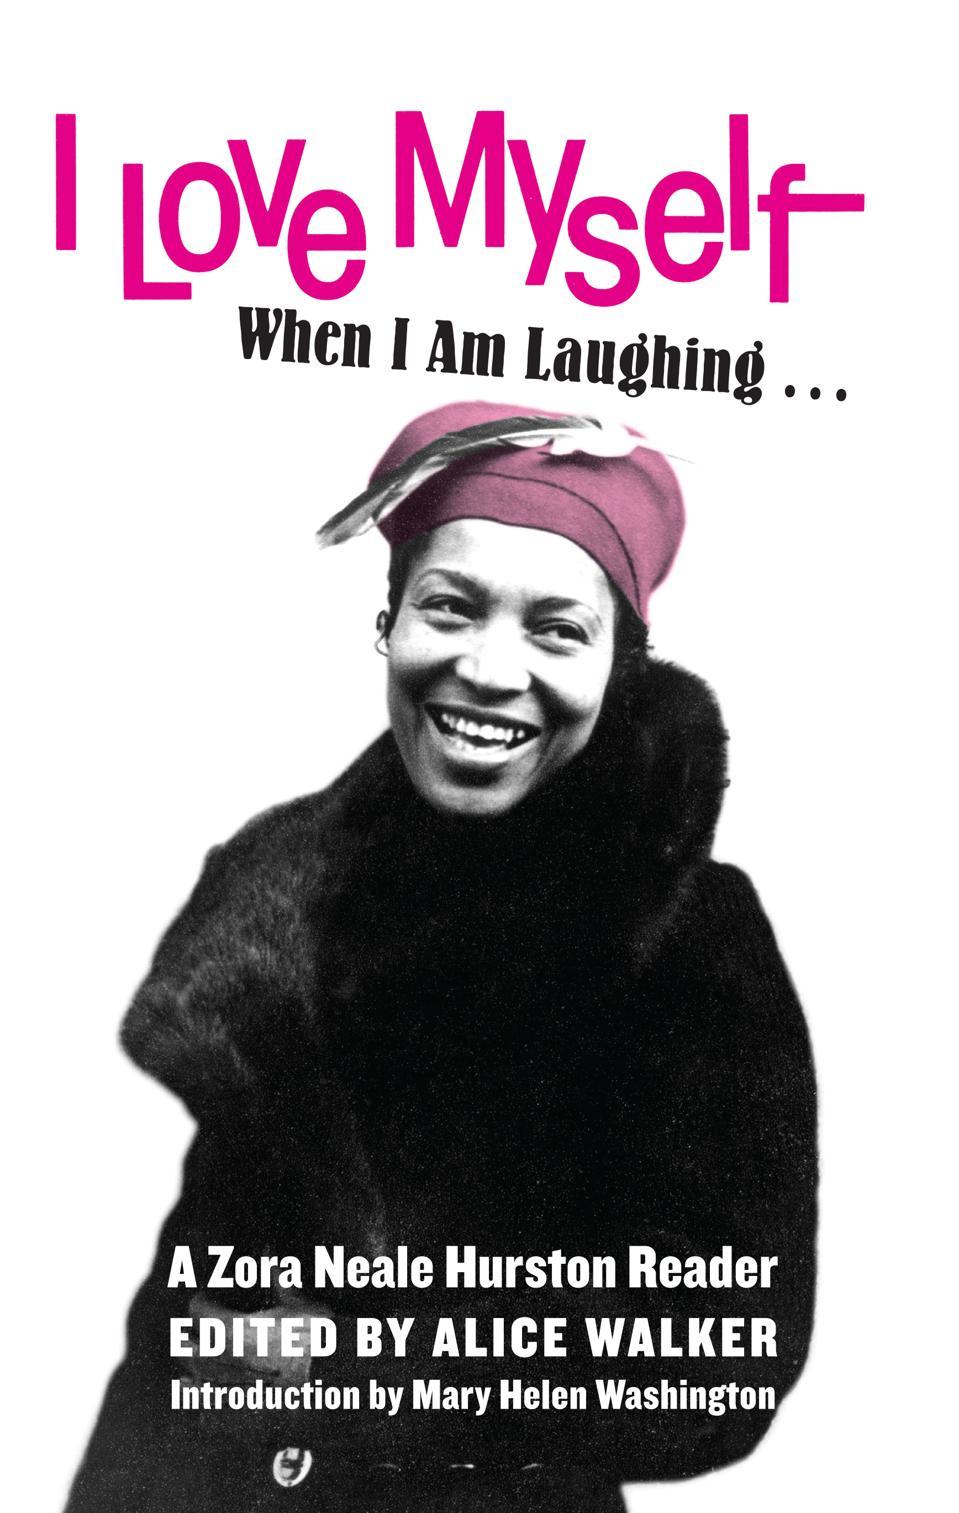 feminist press zora neale hurston reissue publisher I love myself when I am laughing